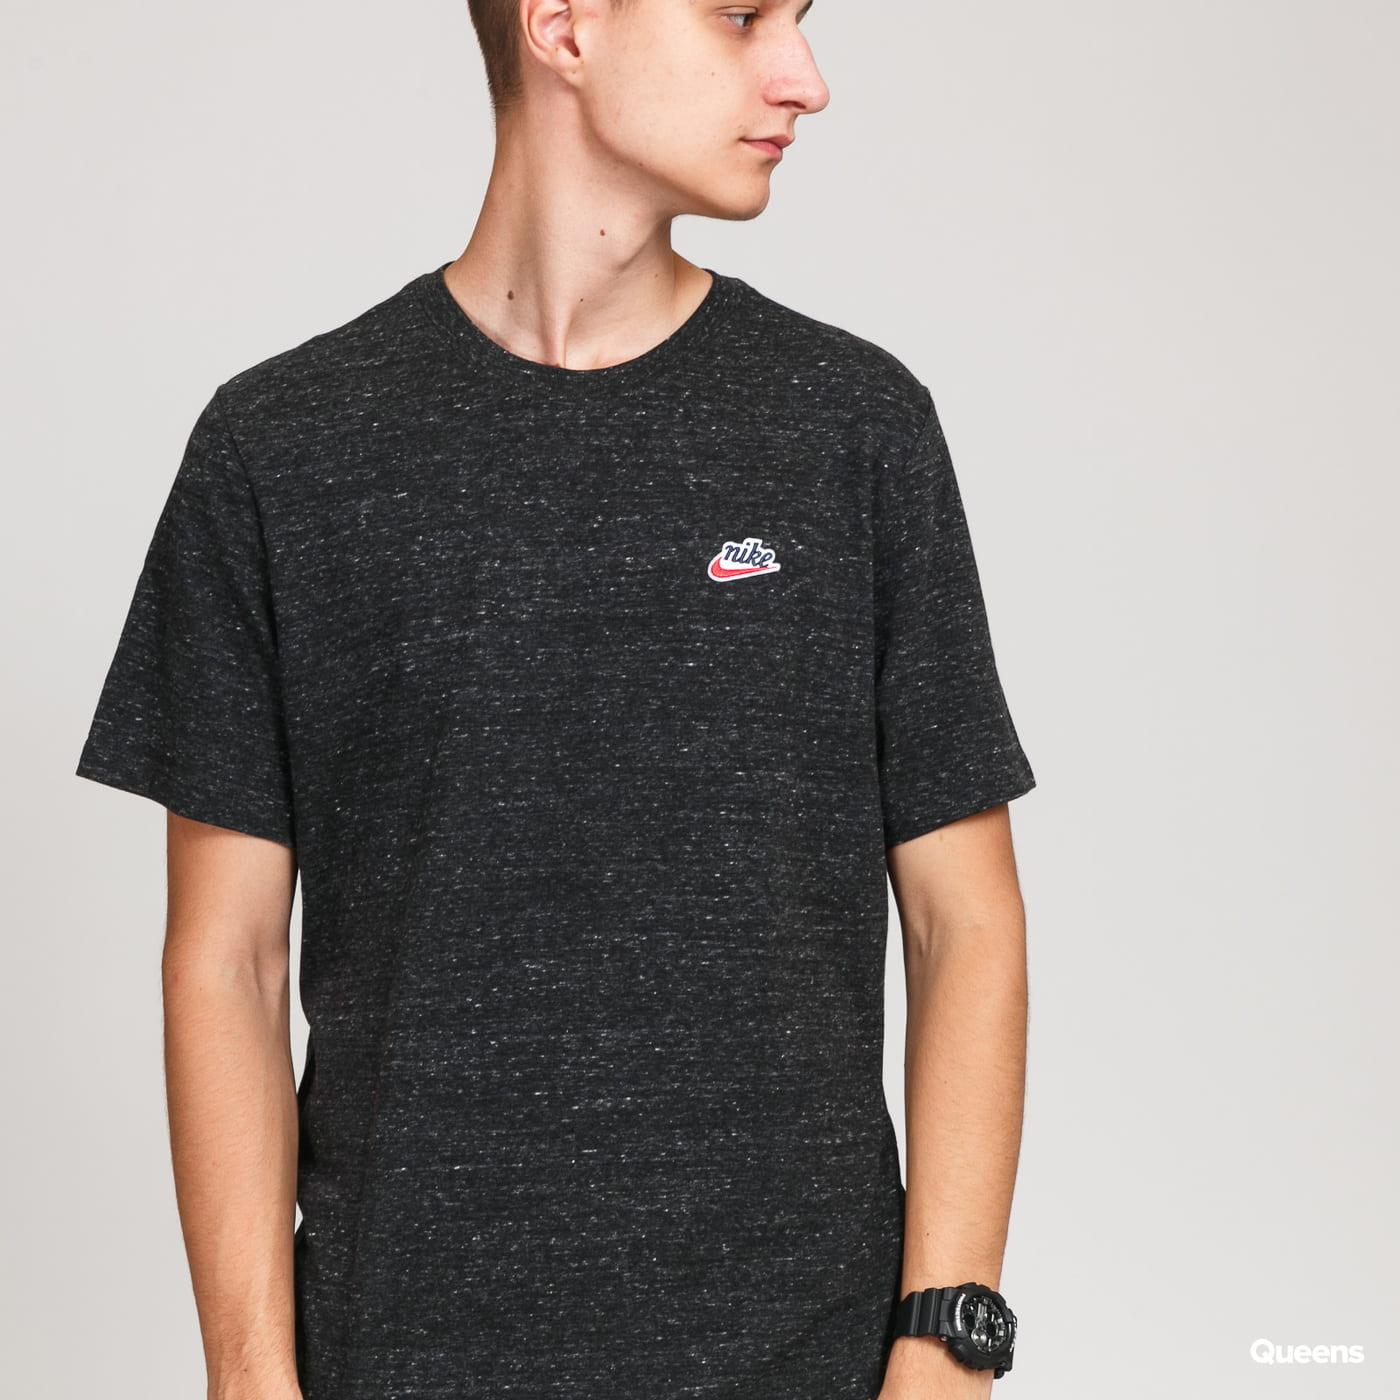 Nike M NSW Heritage + LBR SS melange black